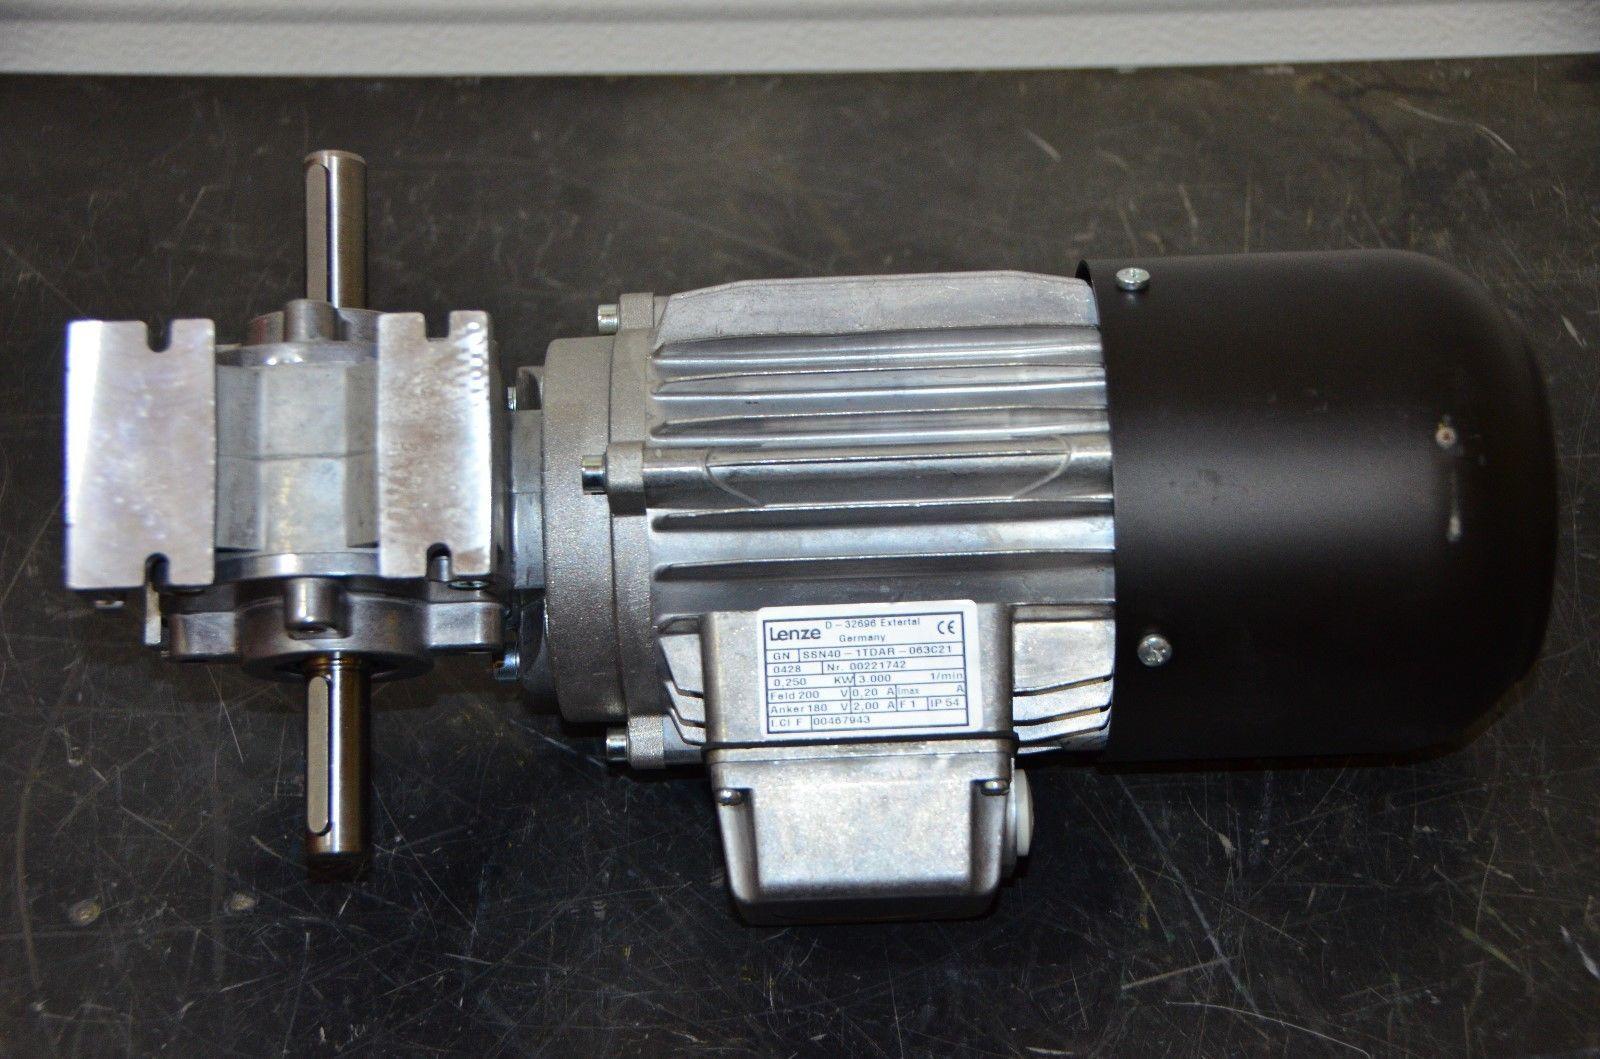 Lenze 0 25 KW I= 80 Gearmotor SSN40-1FDAR and 14 similar items